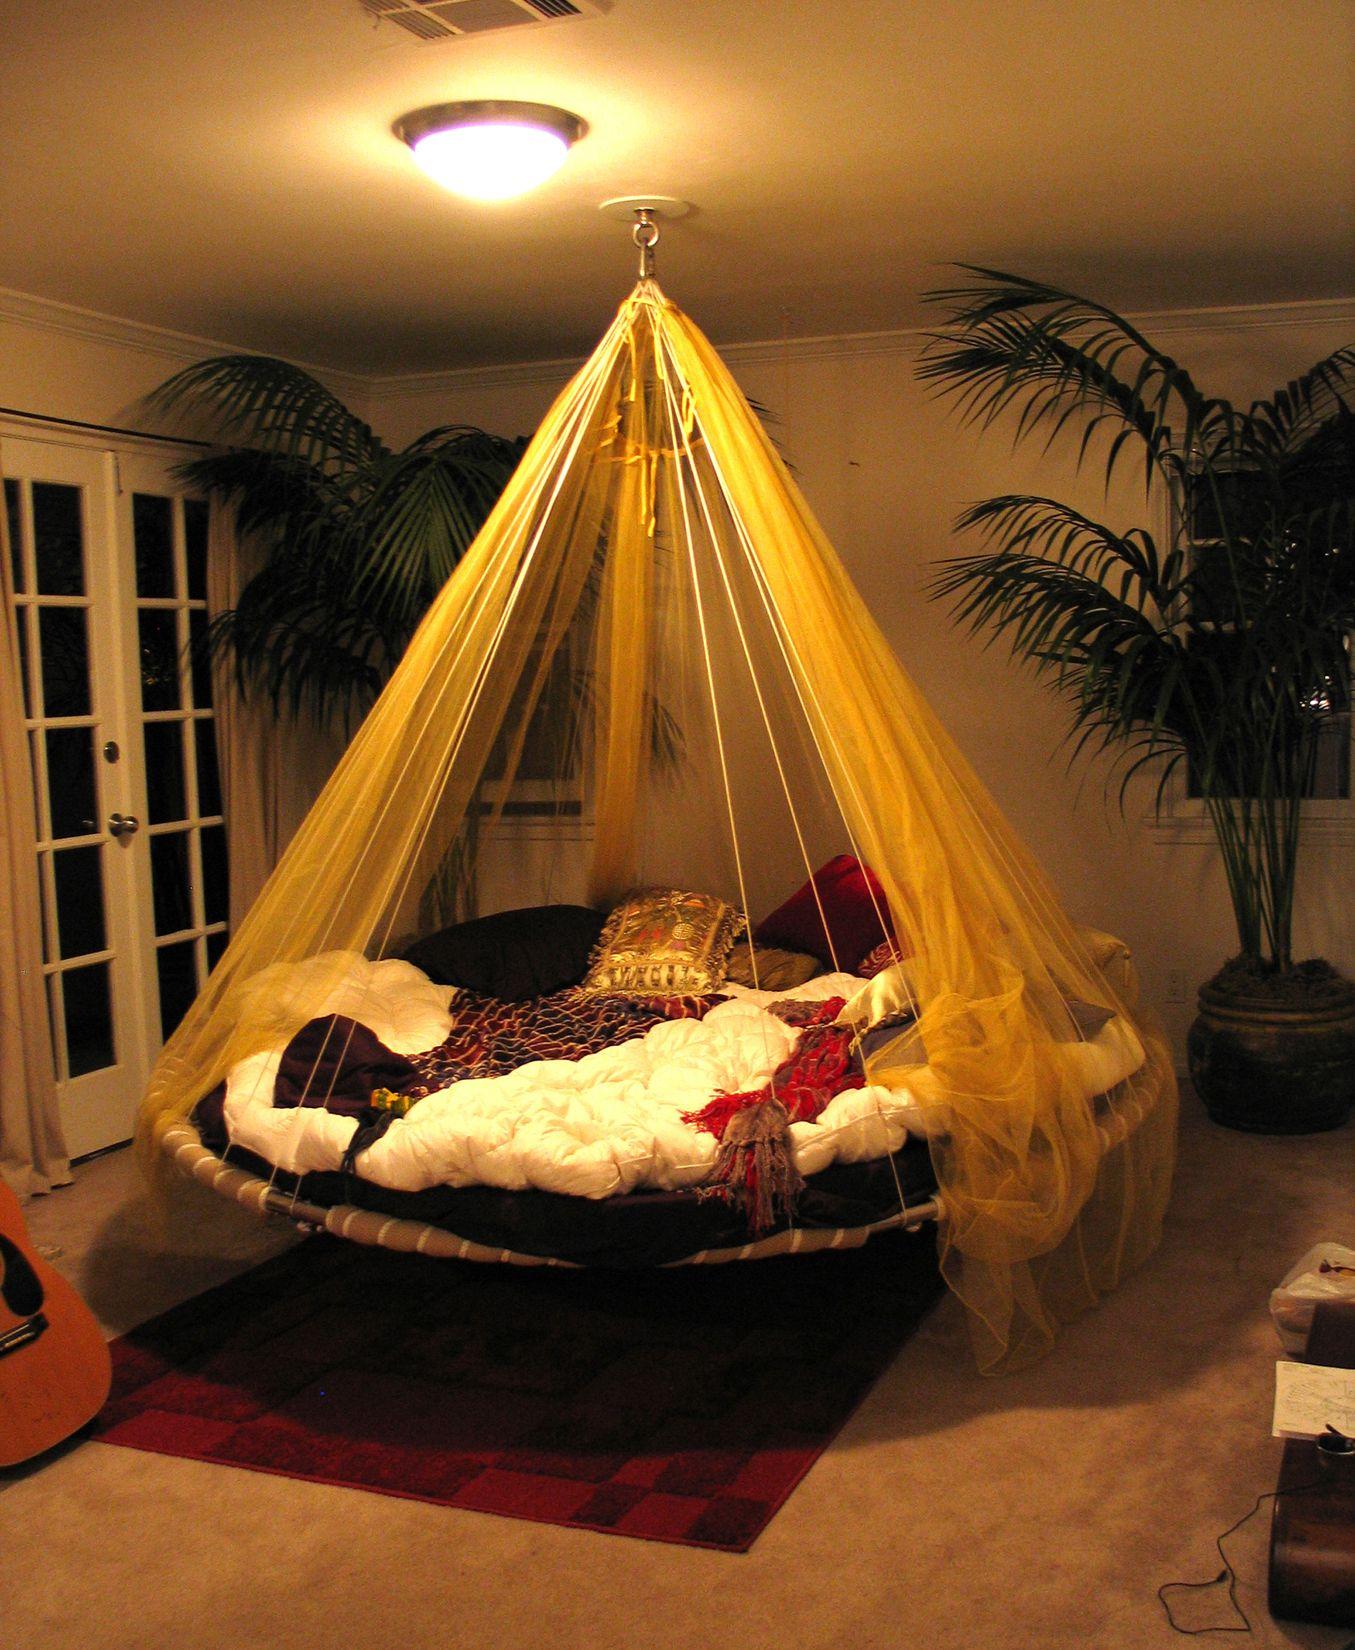 Canopy Hanging Bed Creates Bedroom Decor Indoor Hammock Bed